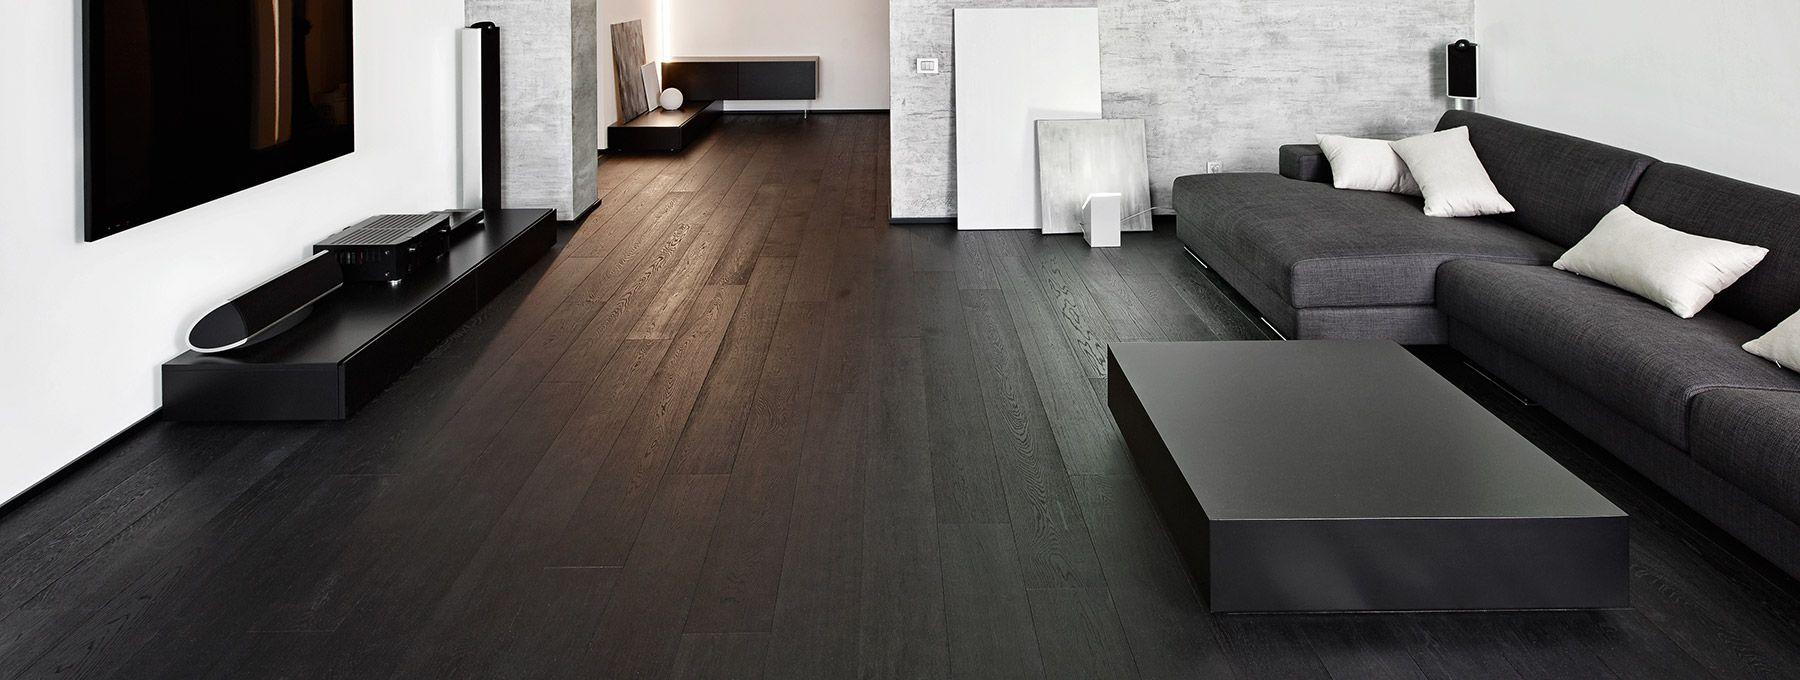 Amitco Flooring Vinyl flooring, Amtico flooring, Flooring